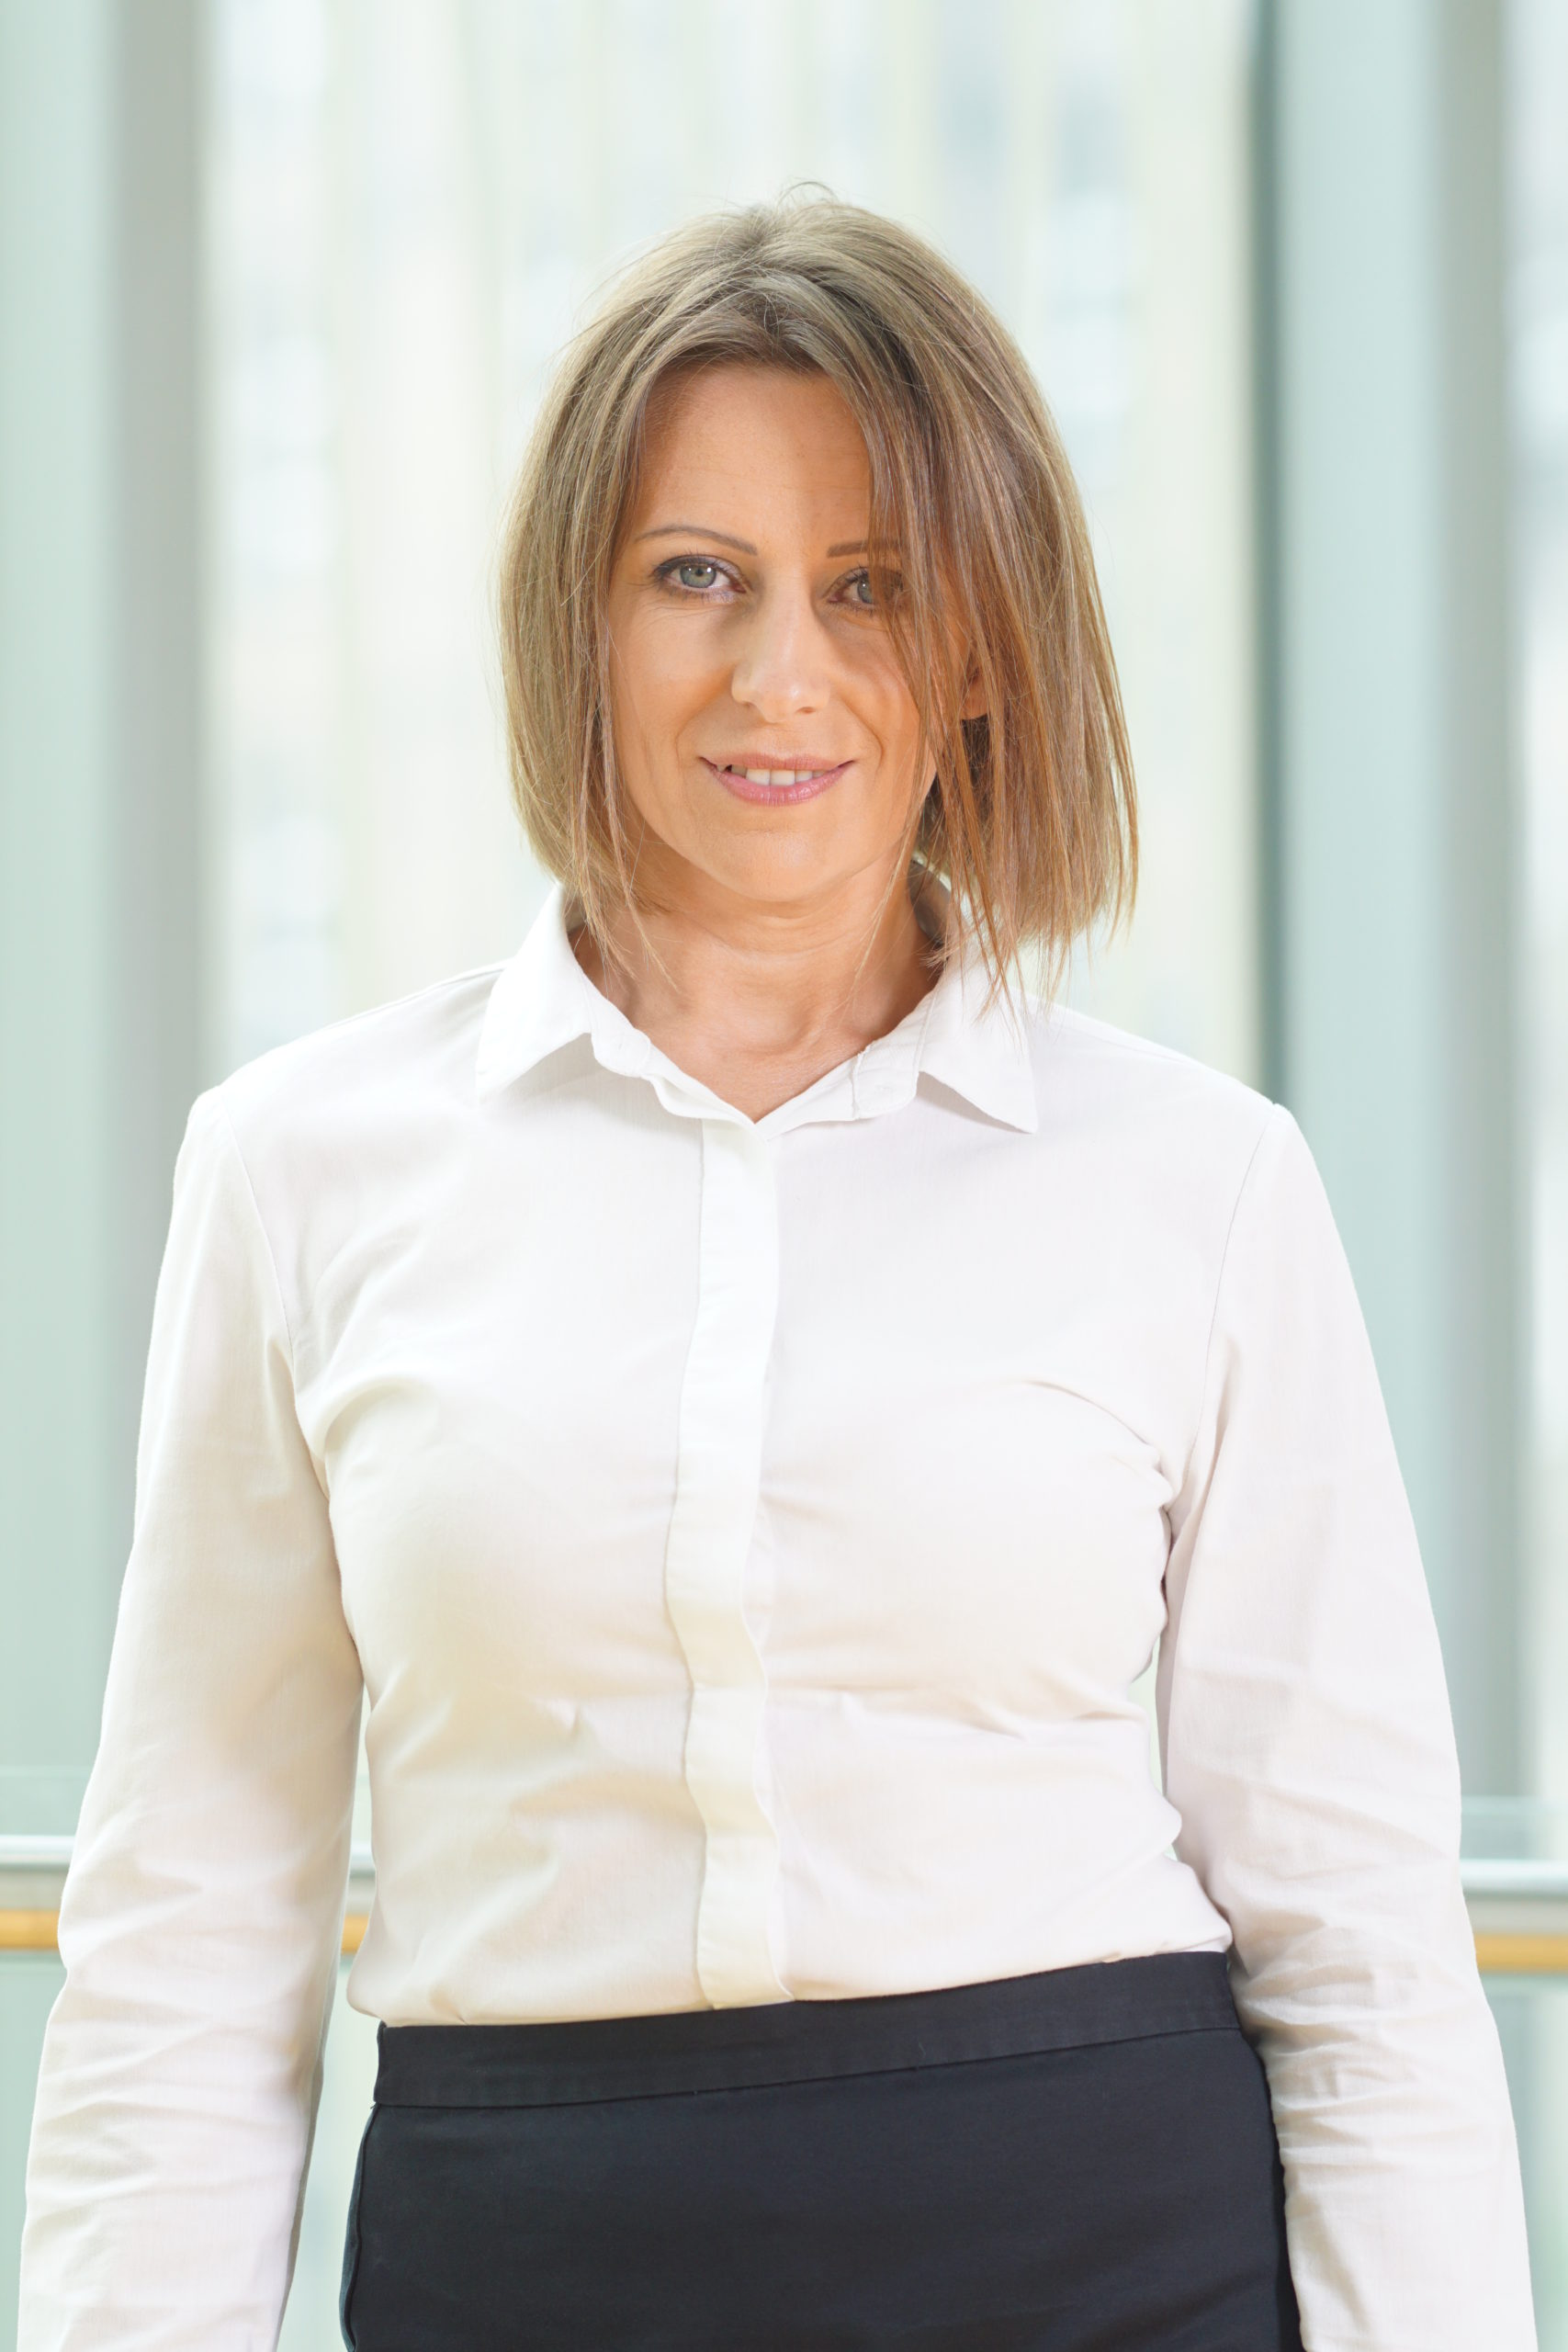 Ewa Florczyk